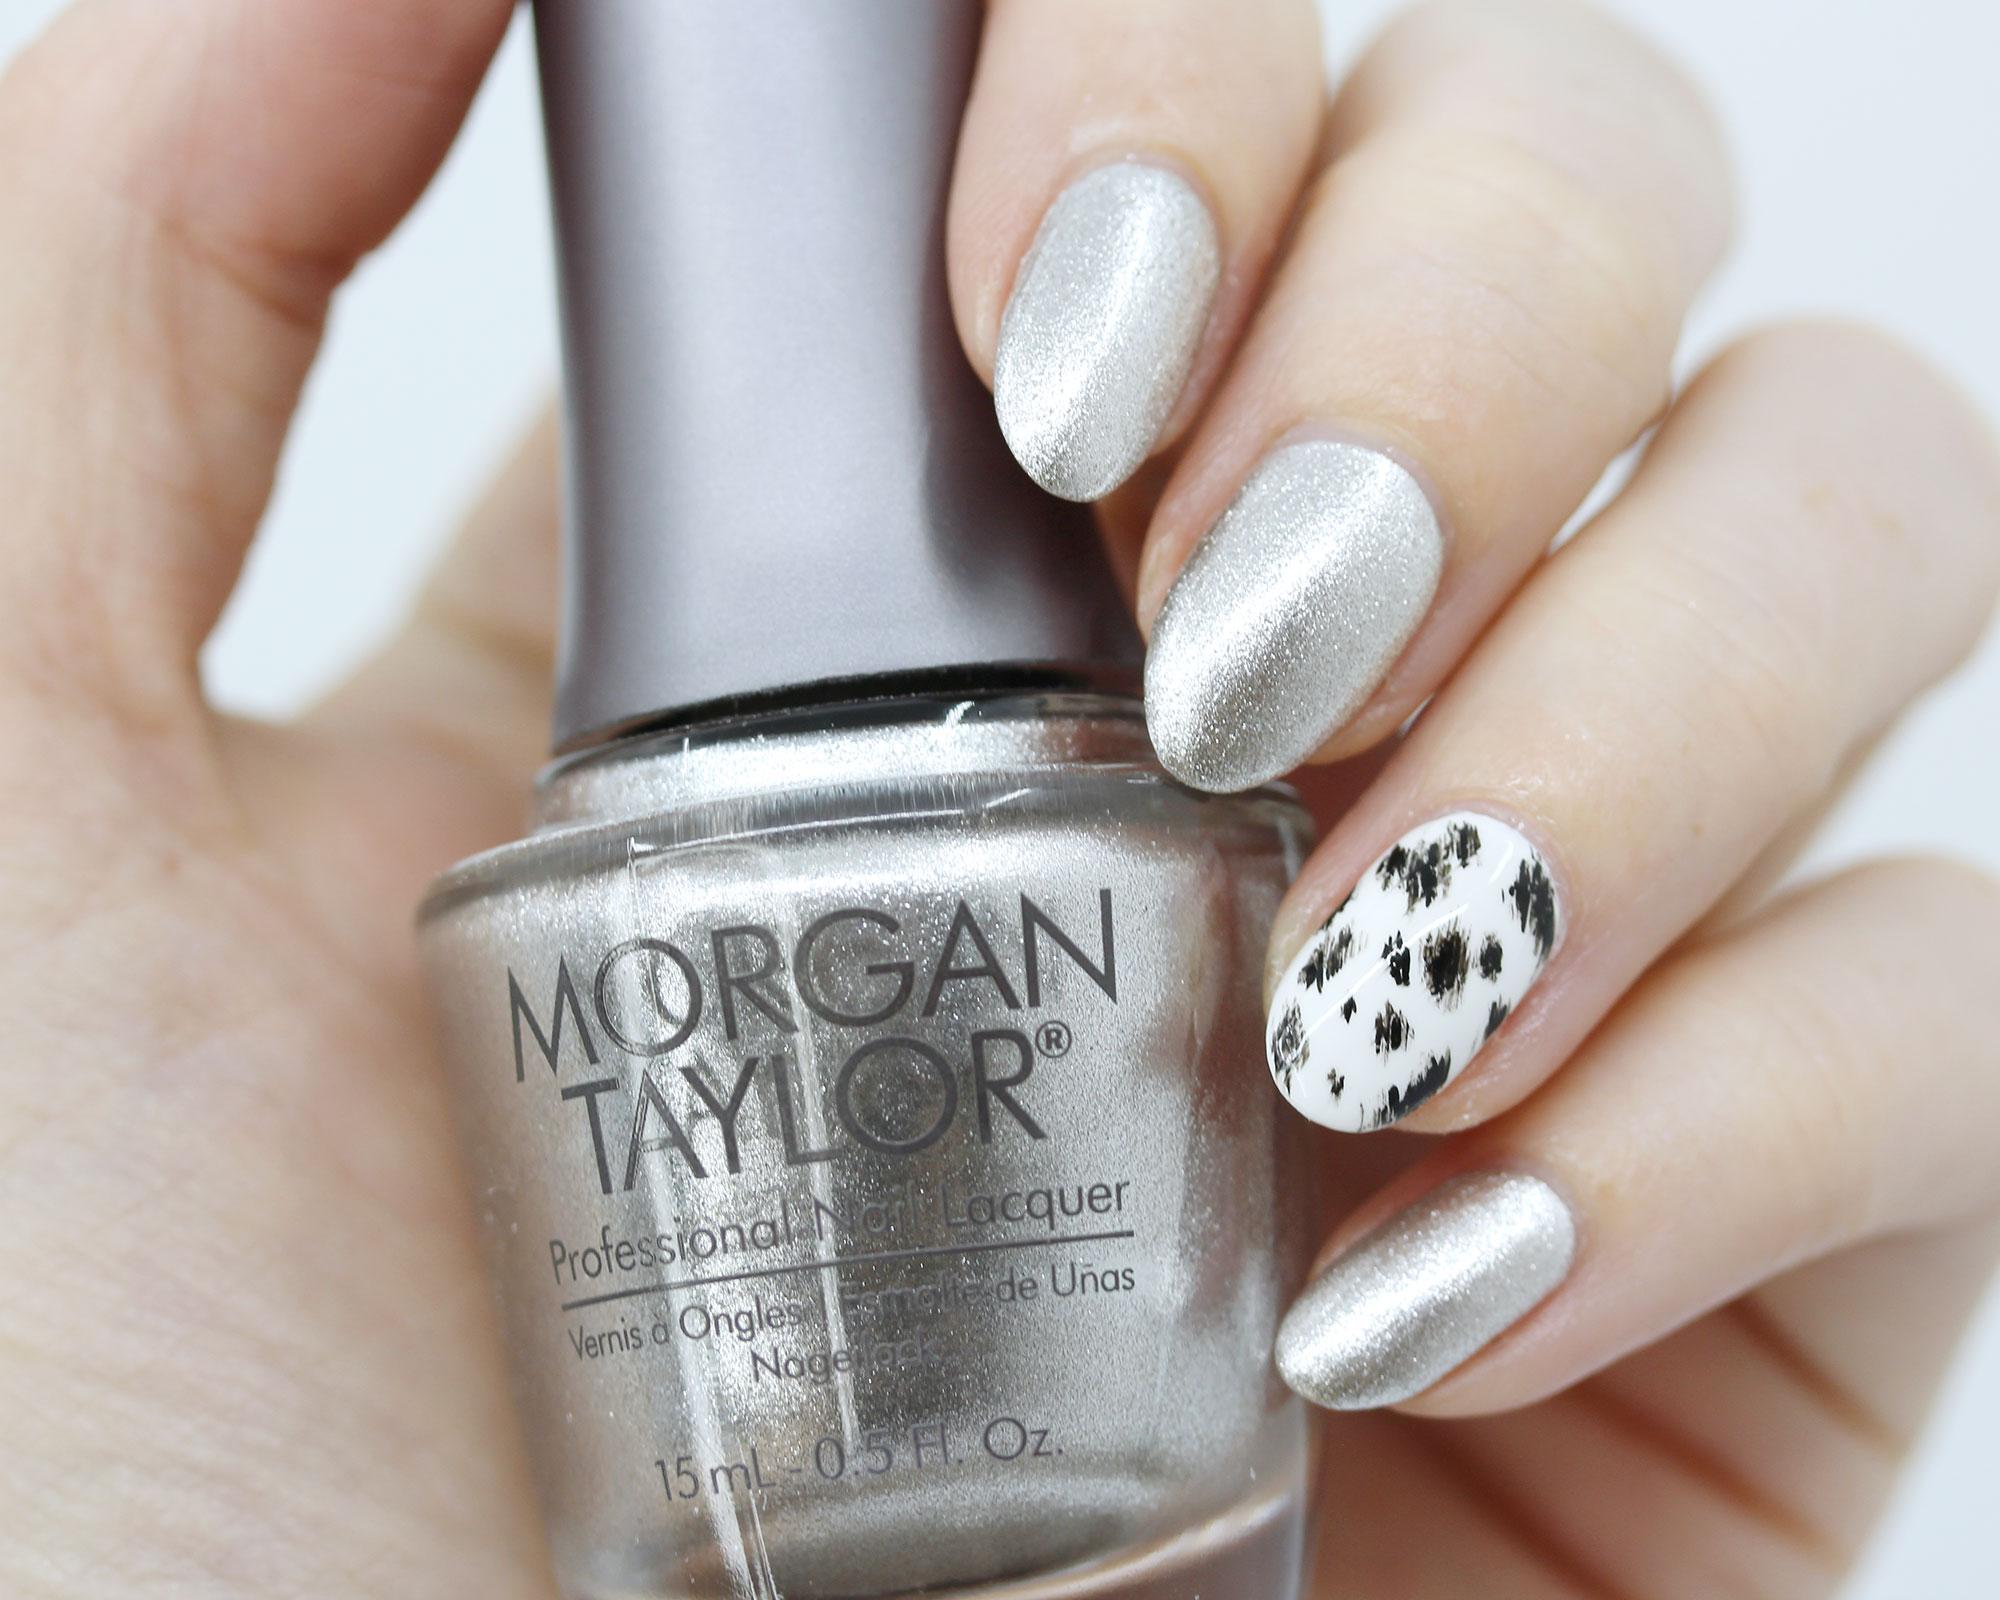 Morgan Taylor Fashion Above All - Disney Cruella de Vil inspired nail polish